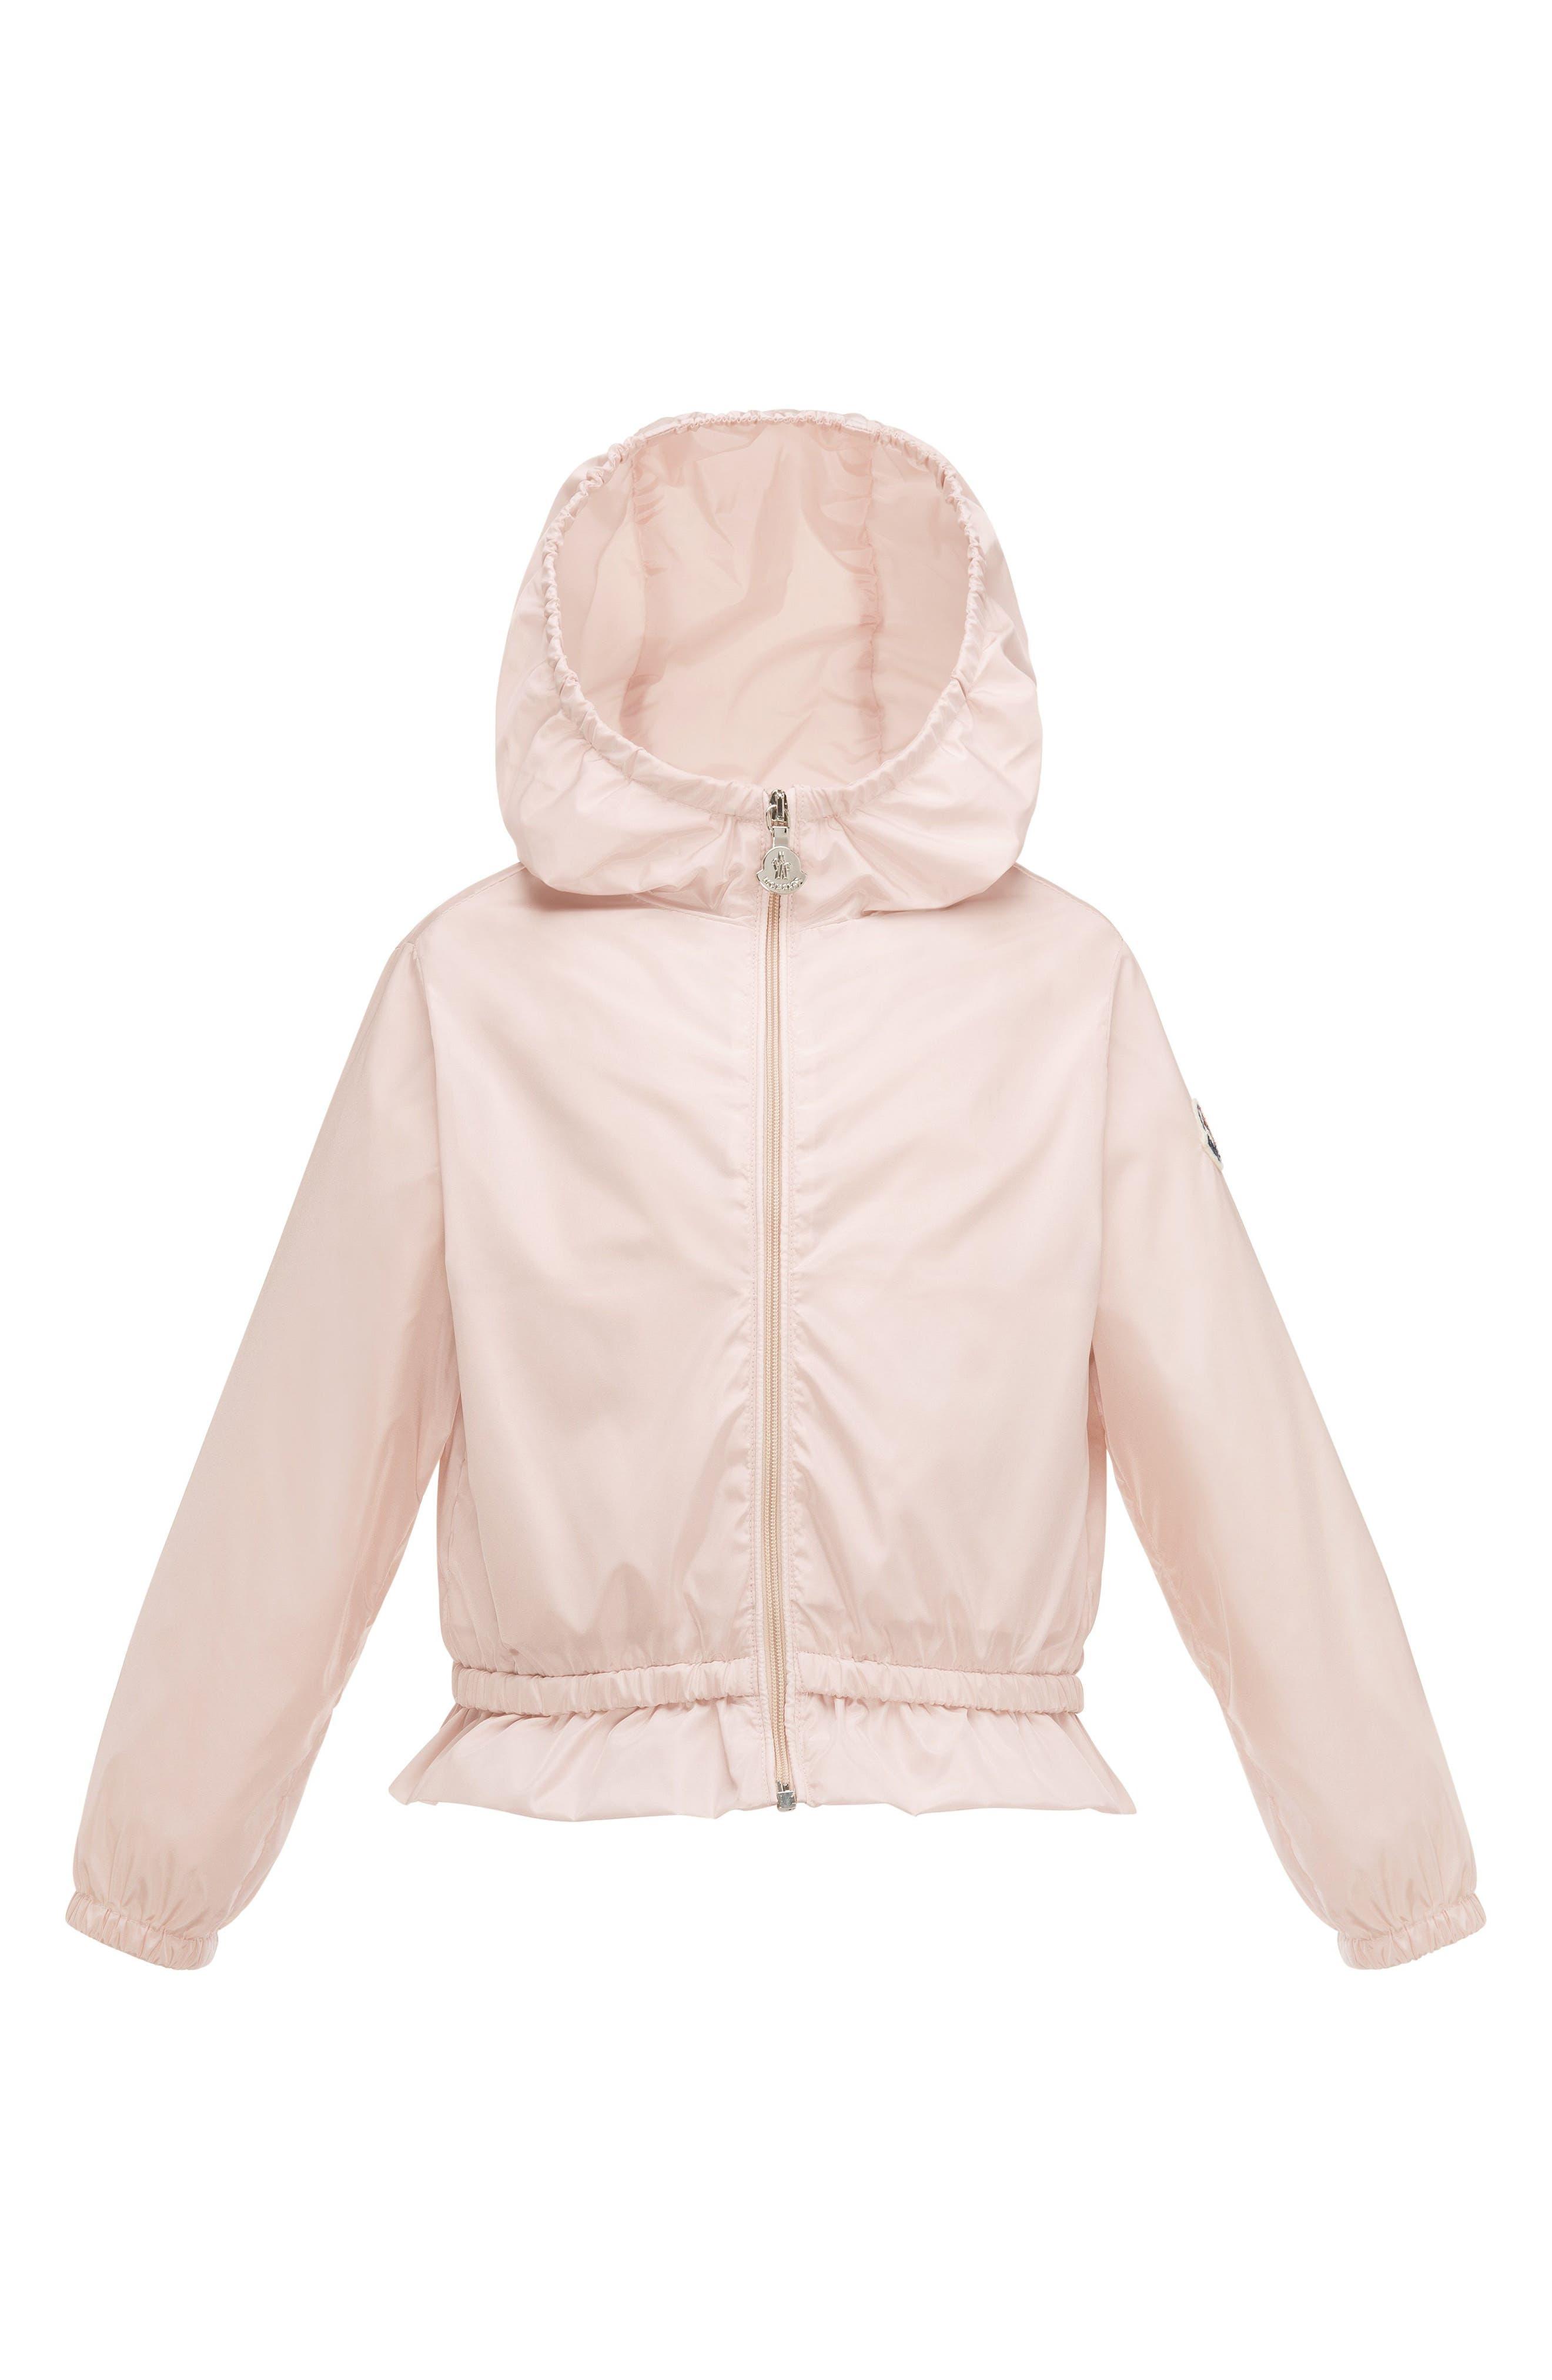 MONCLER Camelien Hooded Water Resistant Windbreaker Jacket